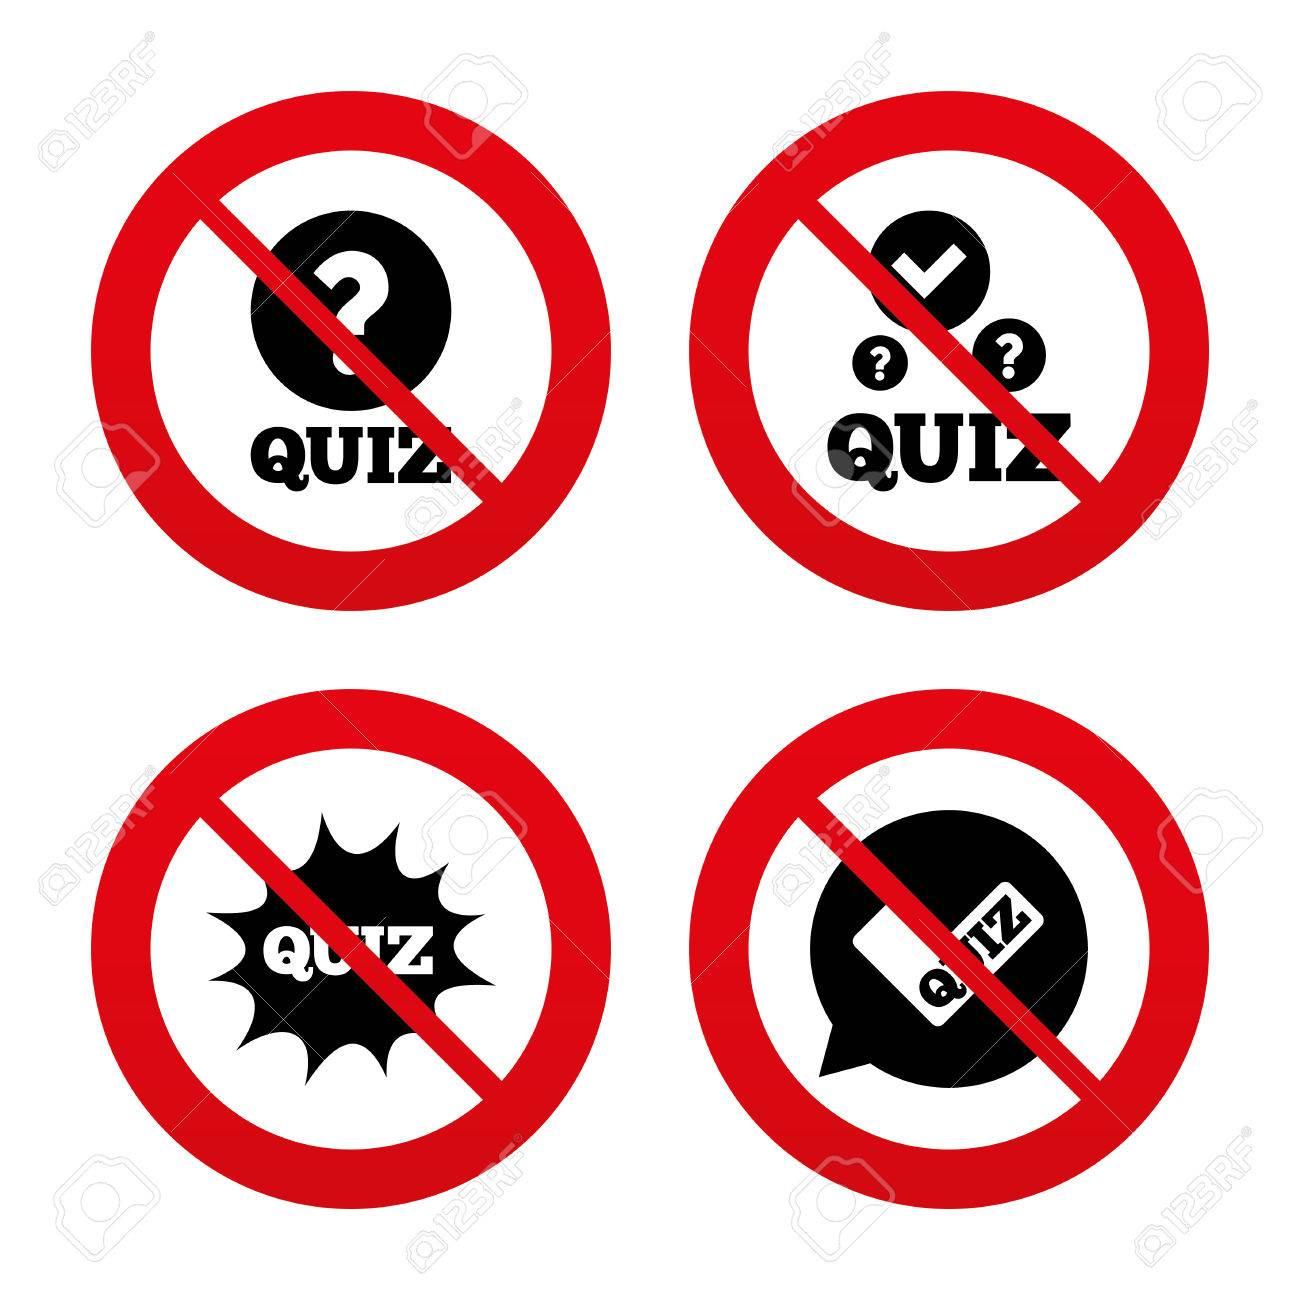 No ban or stop signs quiz icons speech bubble with check mark speech bubble with check mark symbol buycottarizona